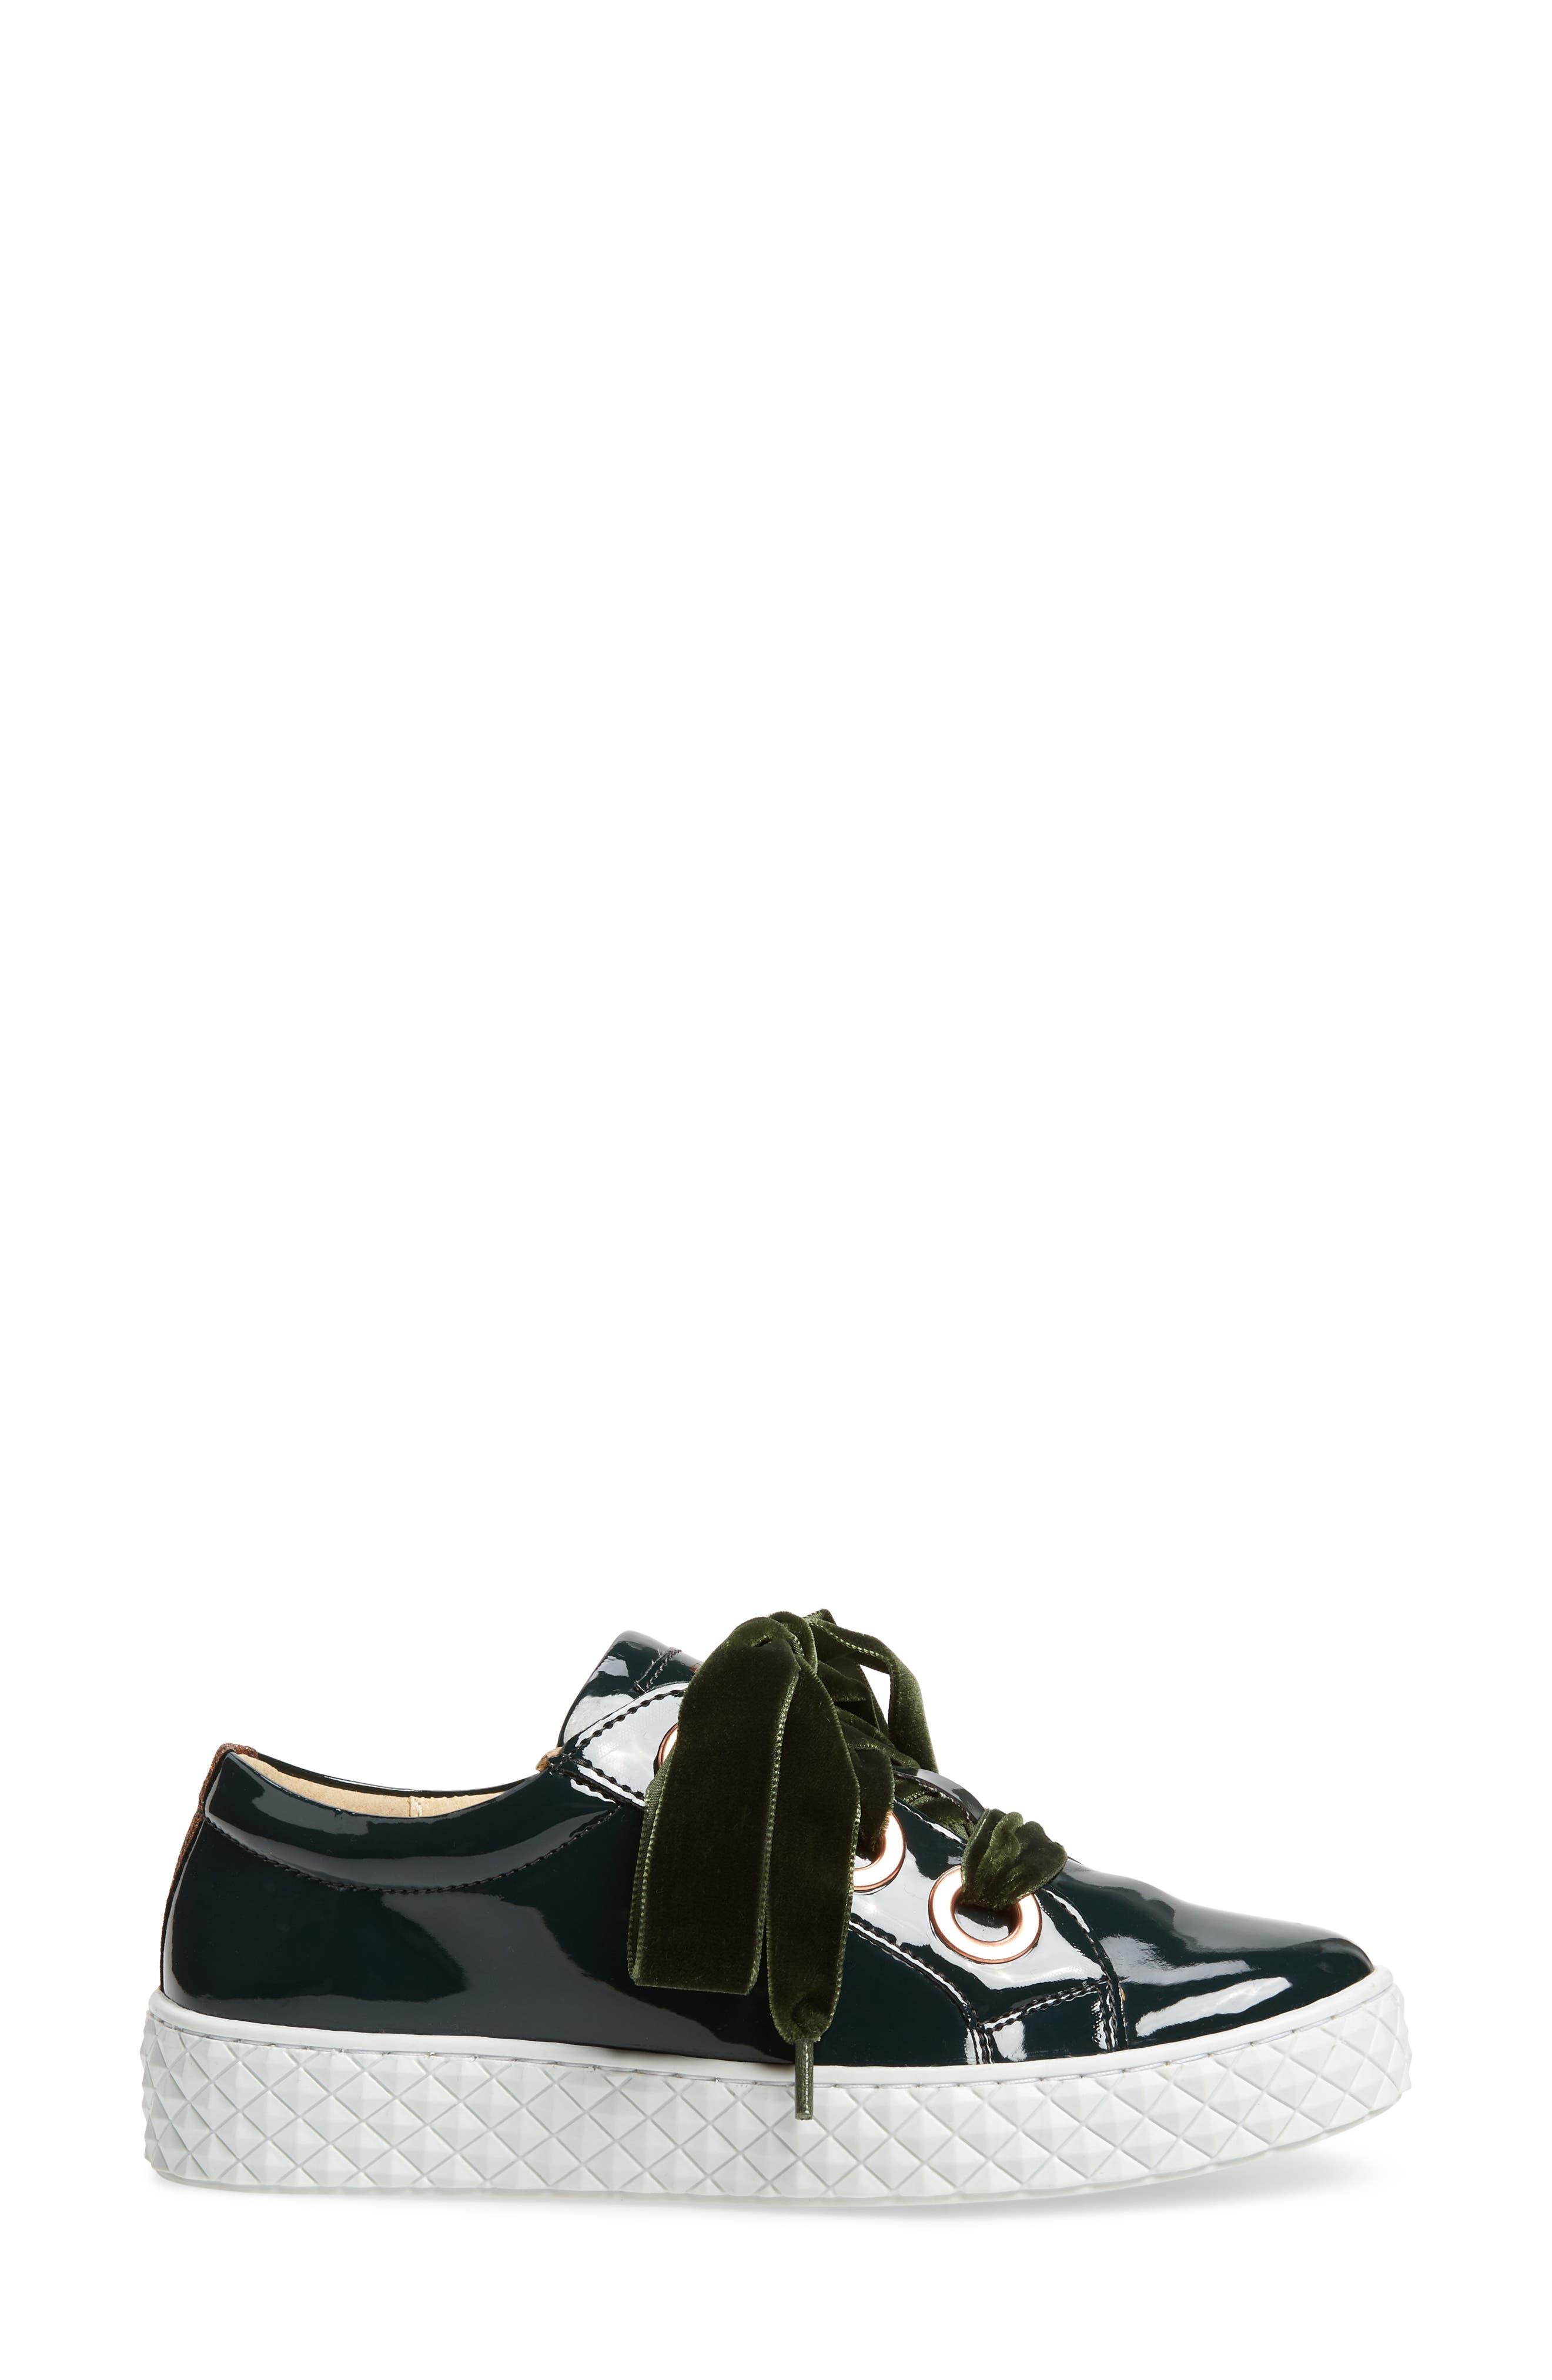 Acton III Sneaker,                             Alternate thumbnail 3, color,                             BOTTLE GREEN LEATHER